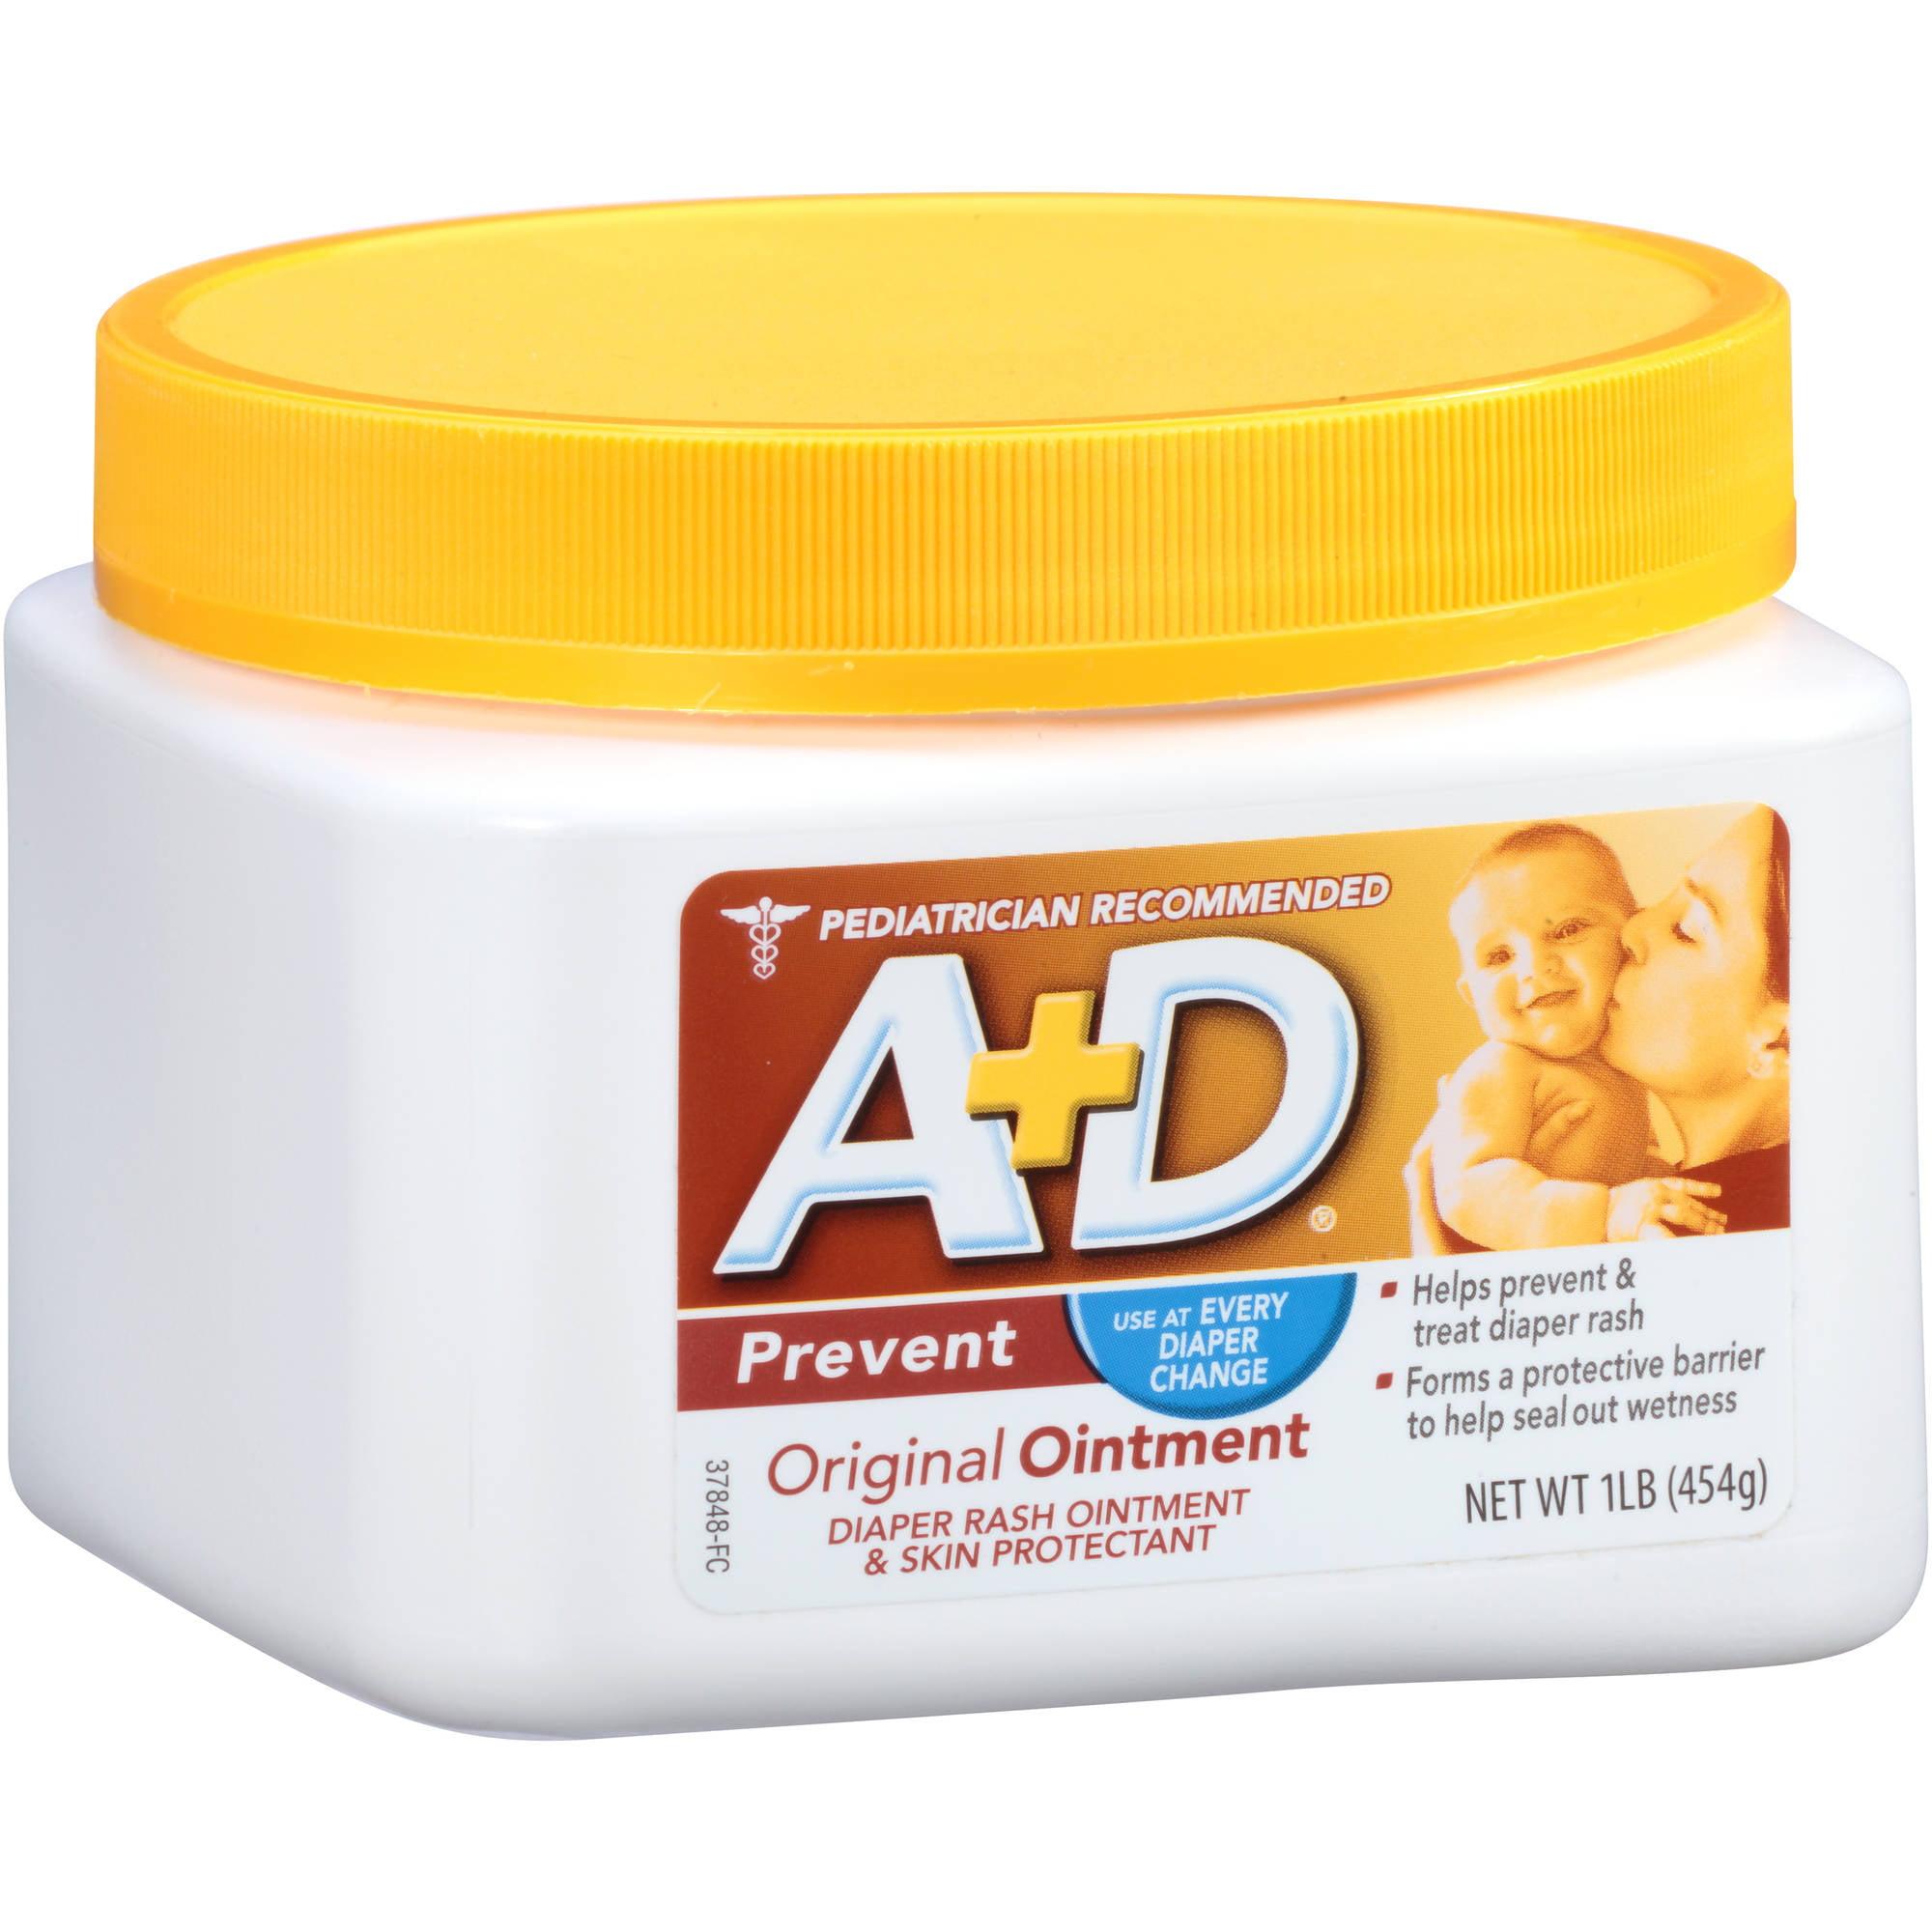 A+D Prevent Original Ointment Diaper Rash Ointment & Skin Protectant, 1 lb